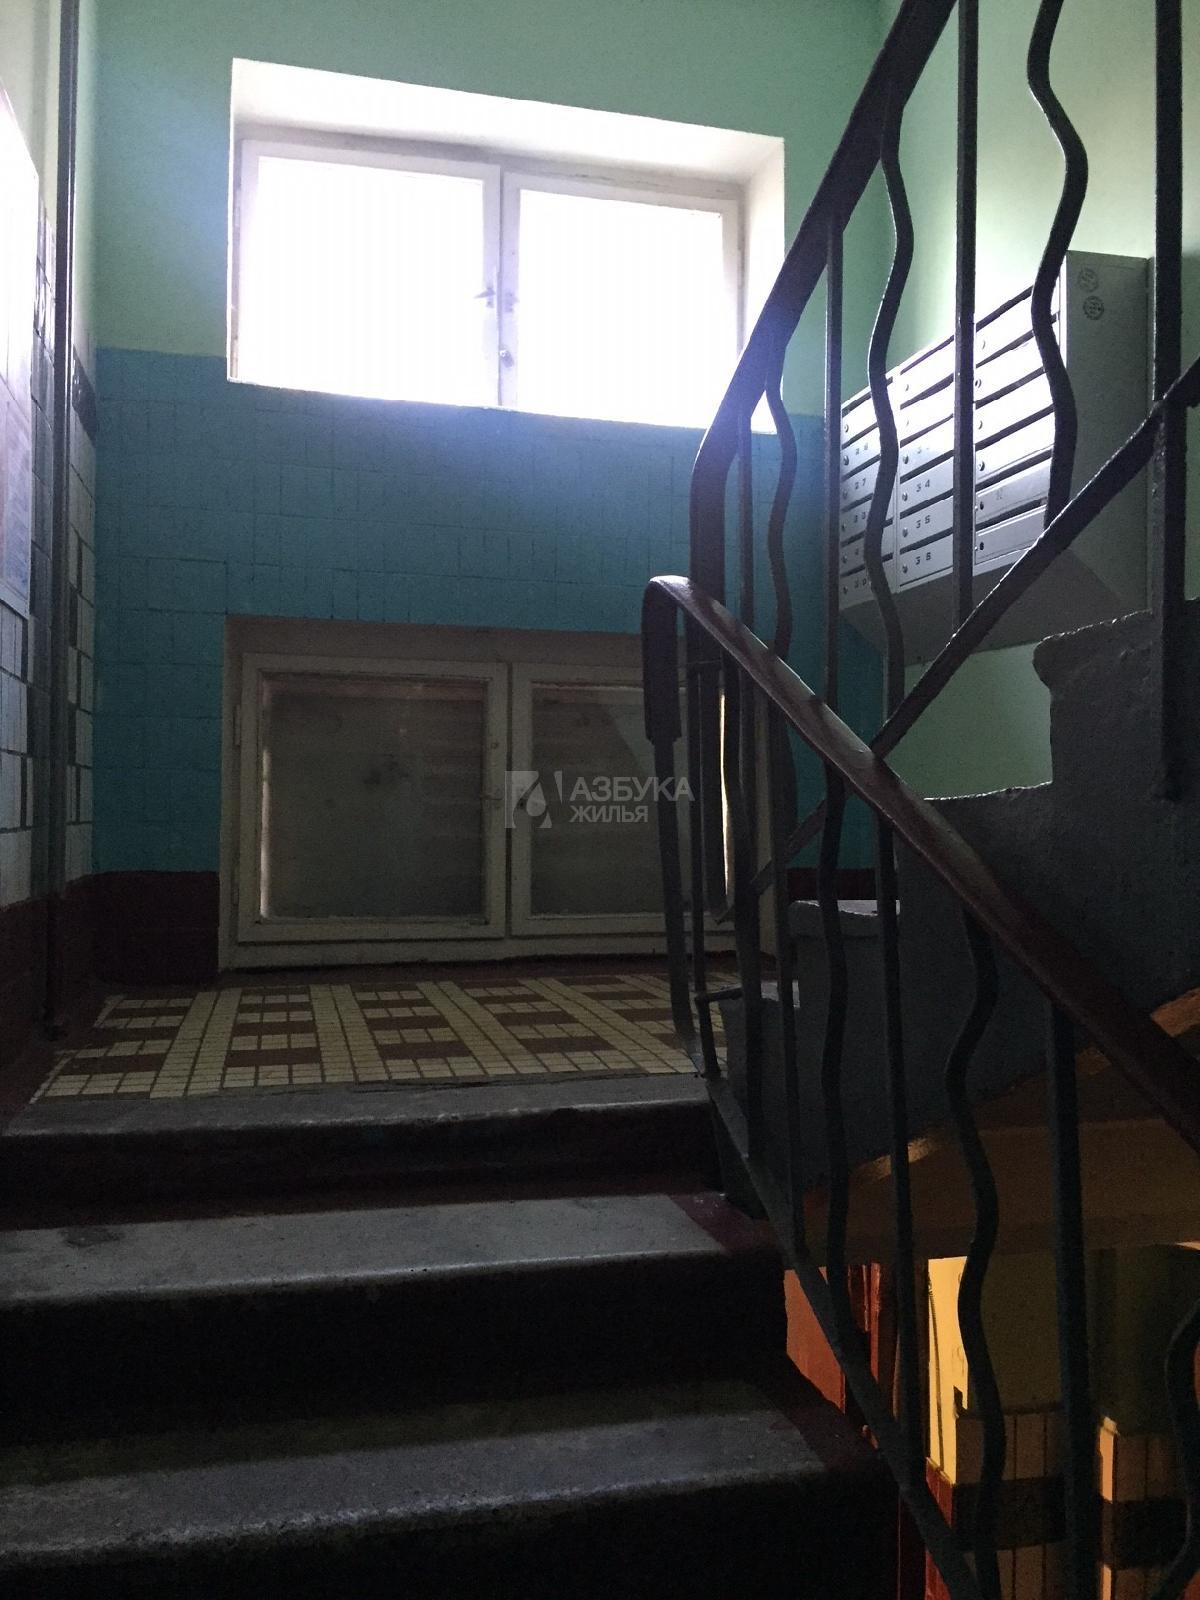 Фото №7 - 3-комнатная квартира, Москва, Криворожская улица 15, метро Нагорная